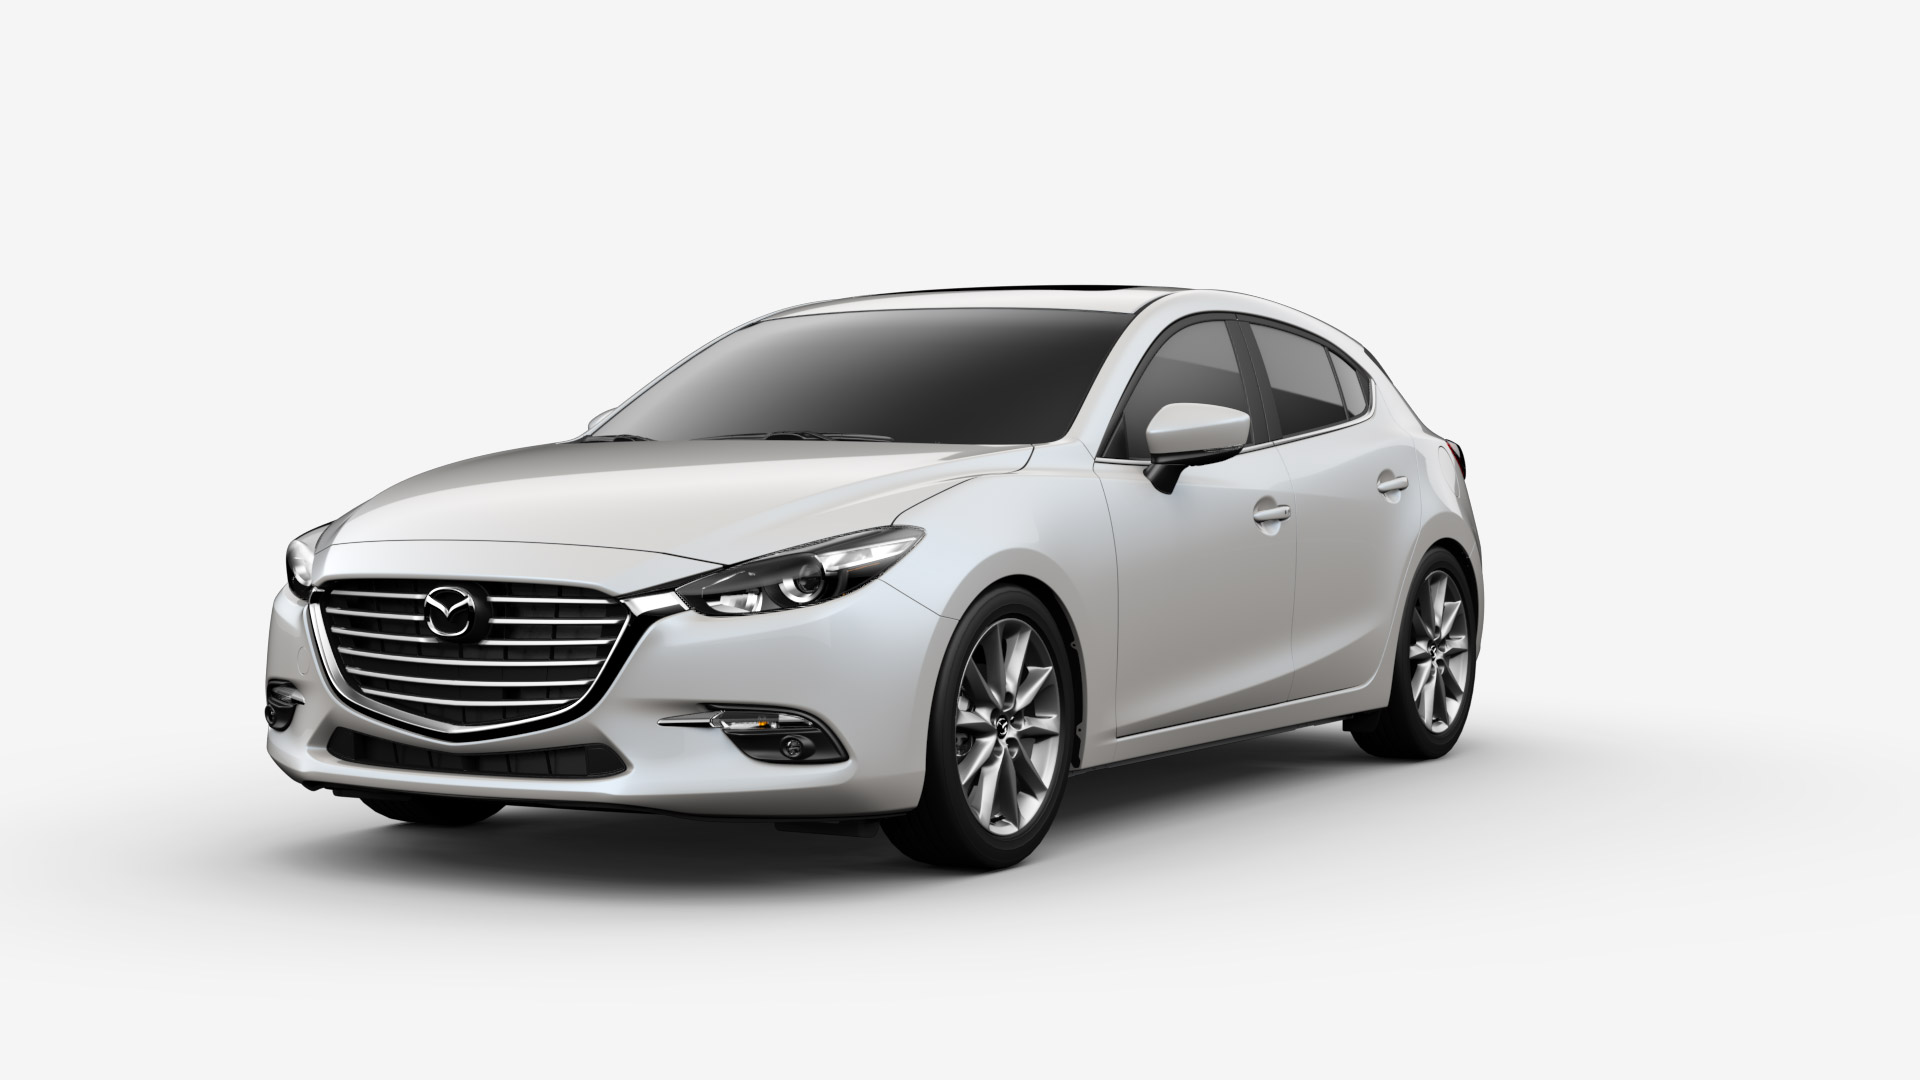 Black Mazda 3 2017 Mazda 3 Hatchback Fuel Efficient Compact Car Mazda Usa